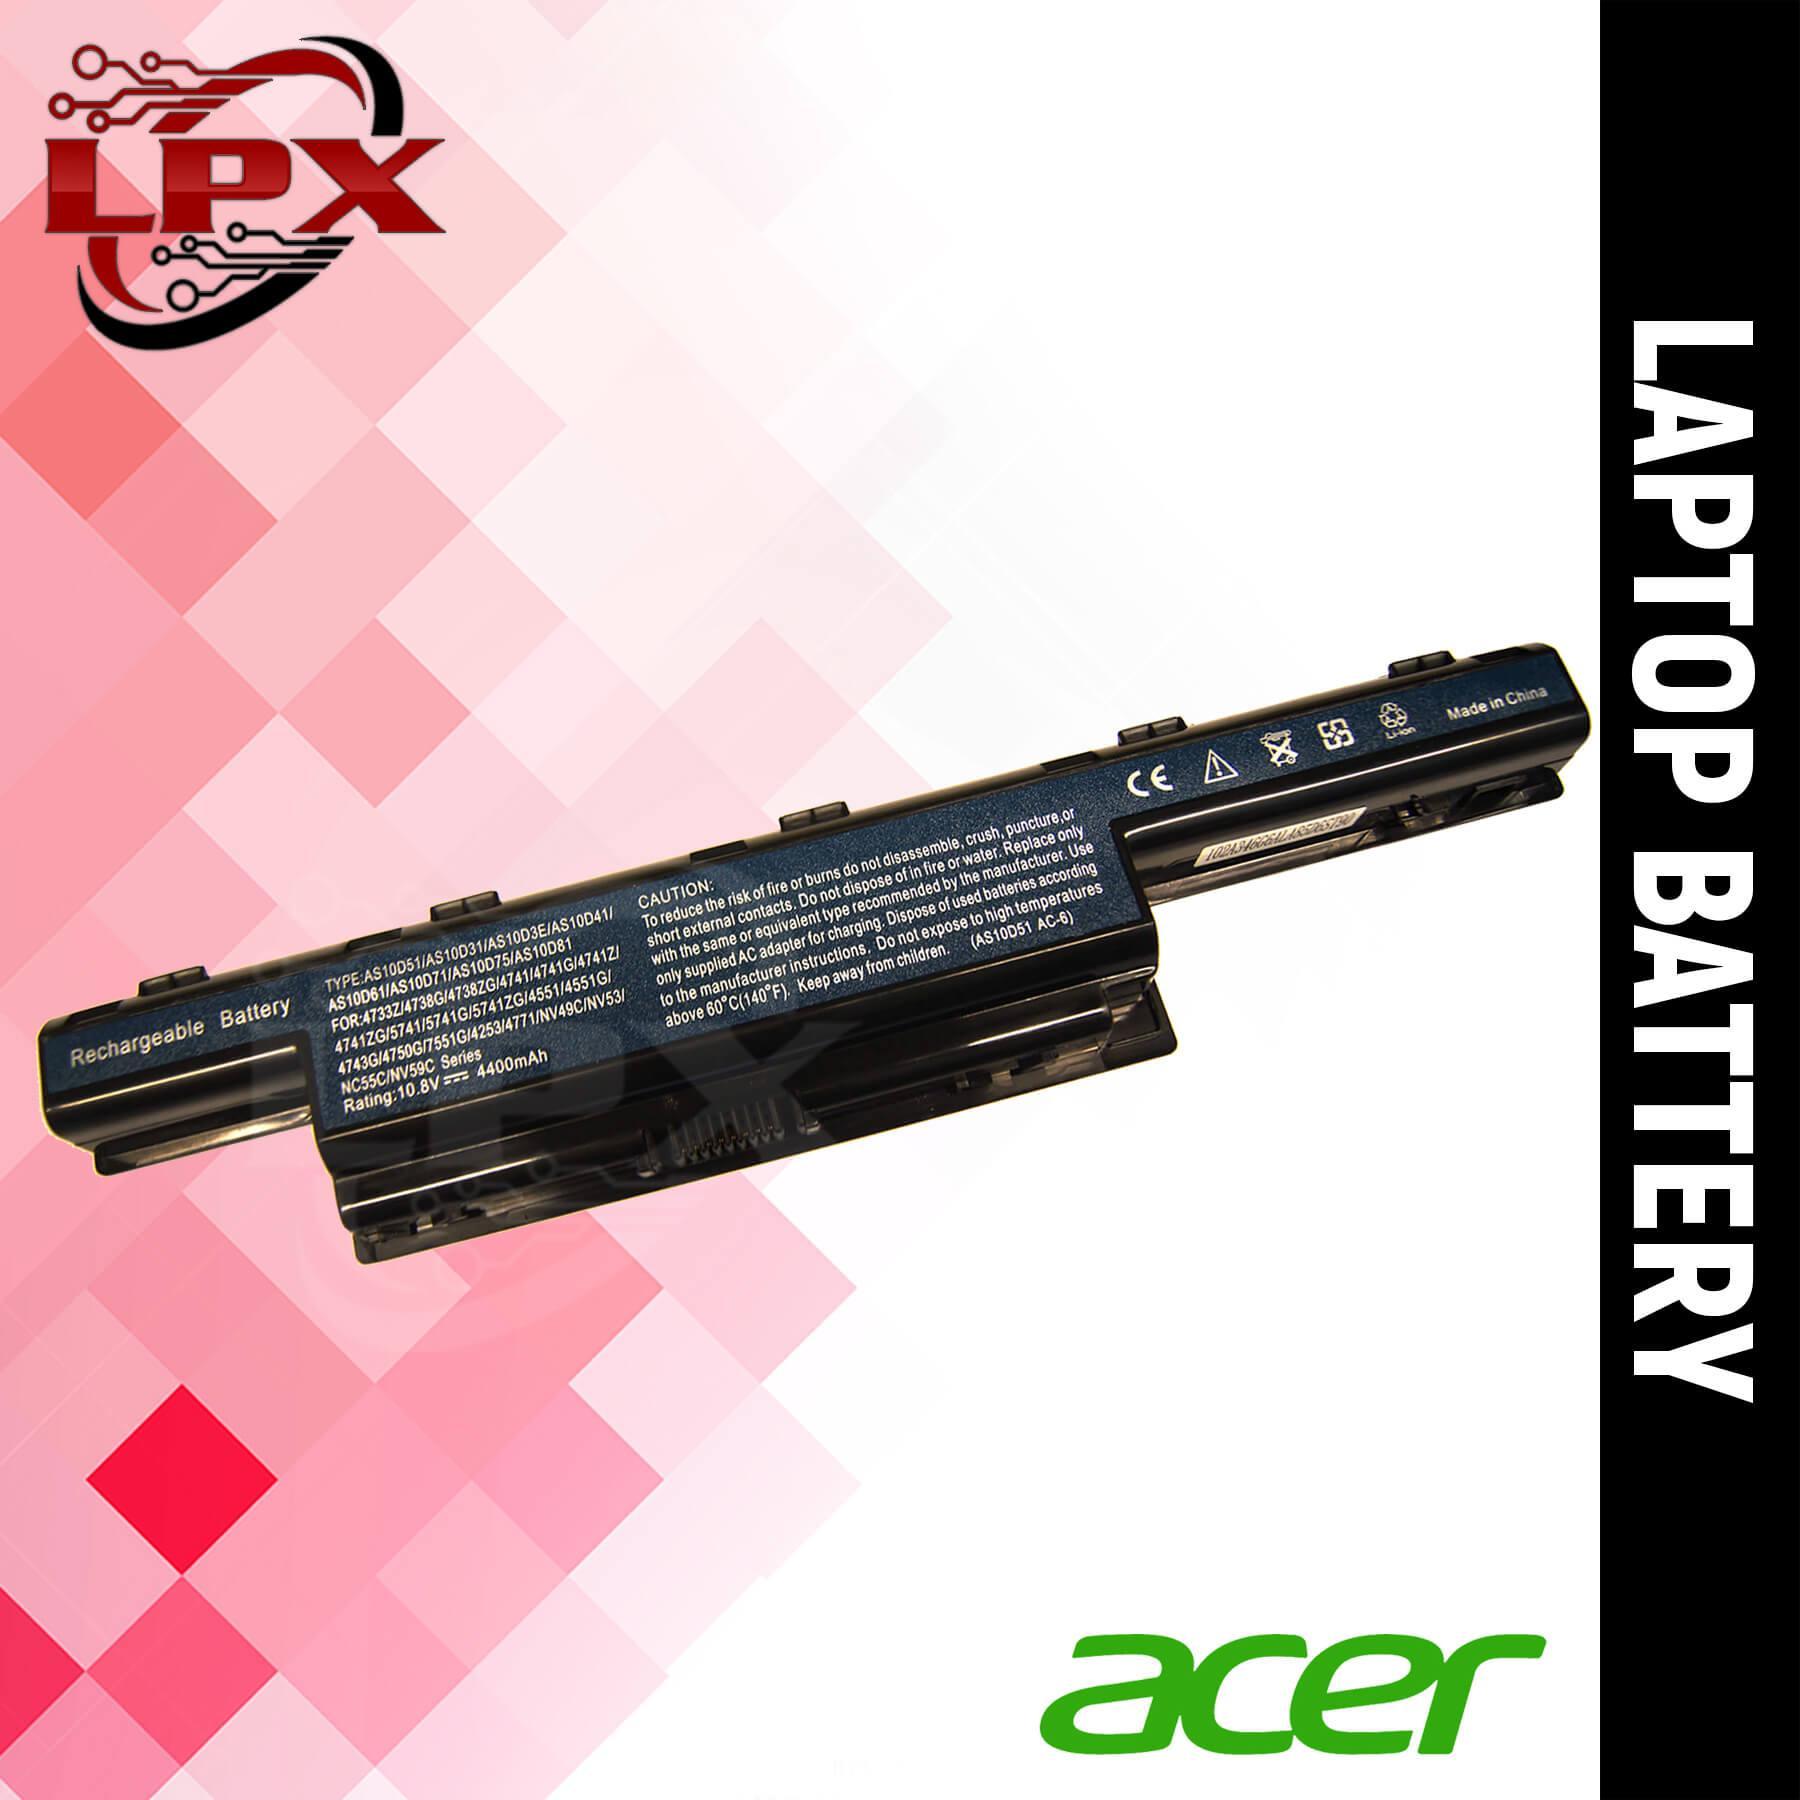 Laptop Battery For Acer Aspire 4741/5741/5742/5750/4755/4752